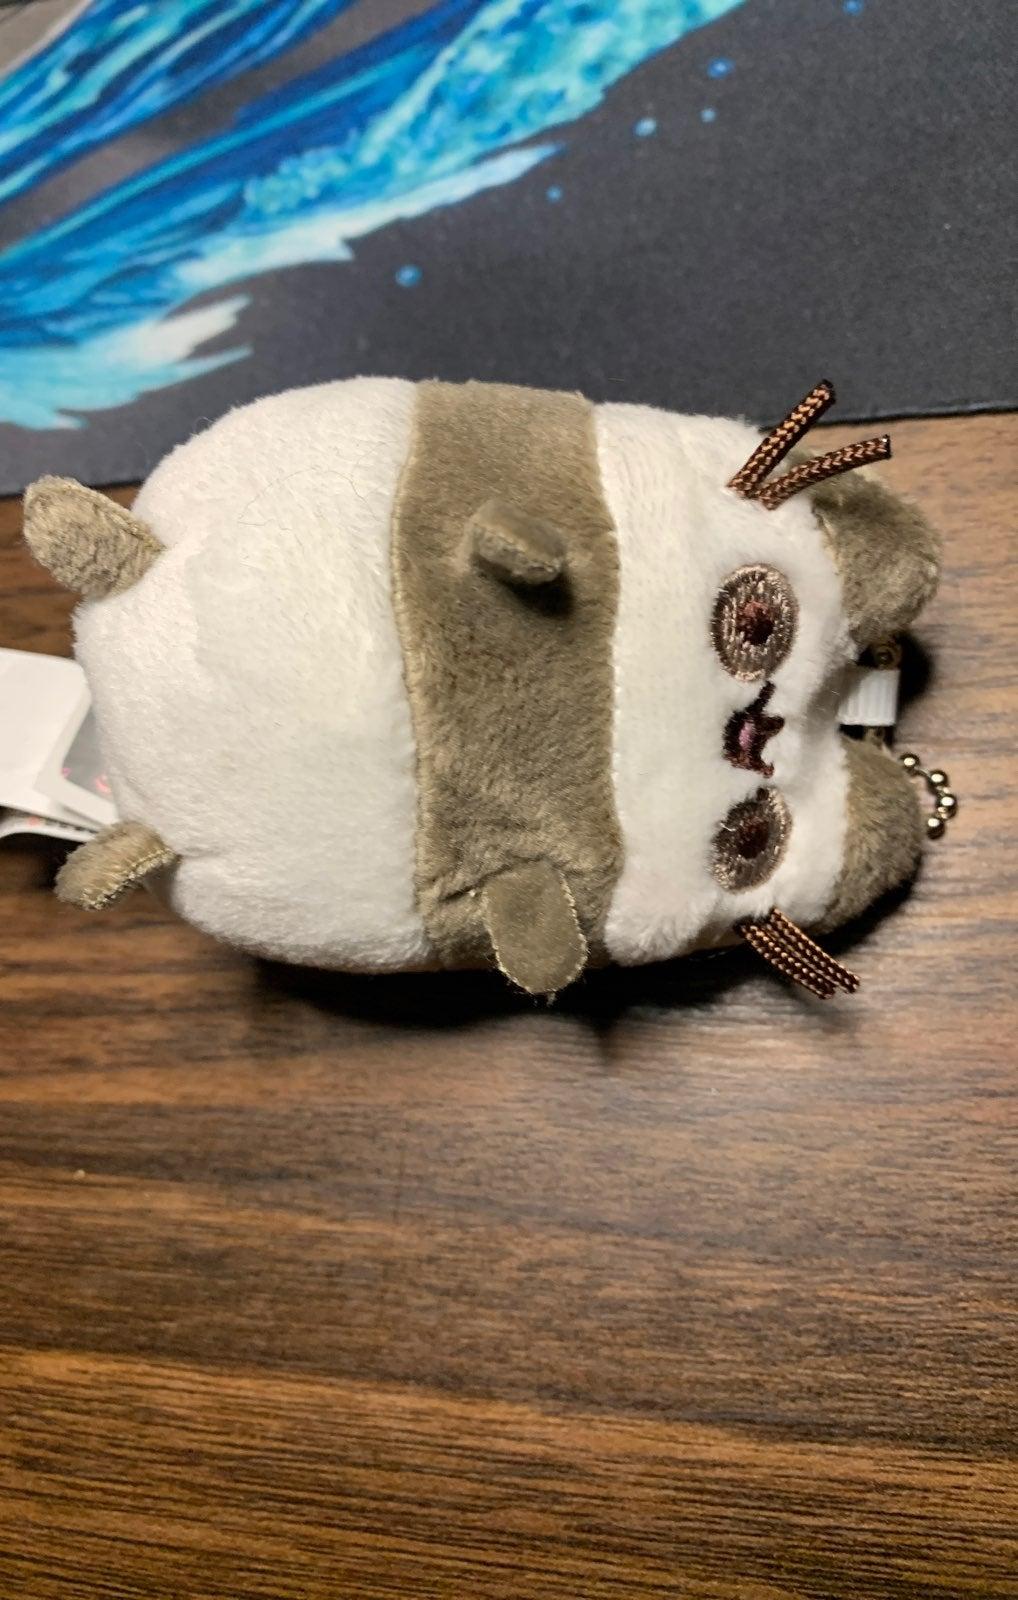 Demdaco Hedgehog Plush Stuffed Animal